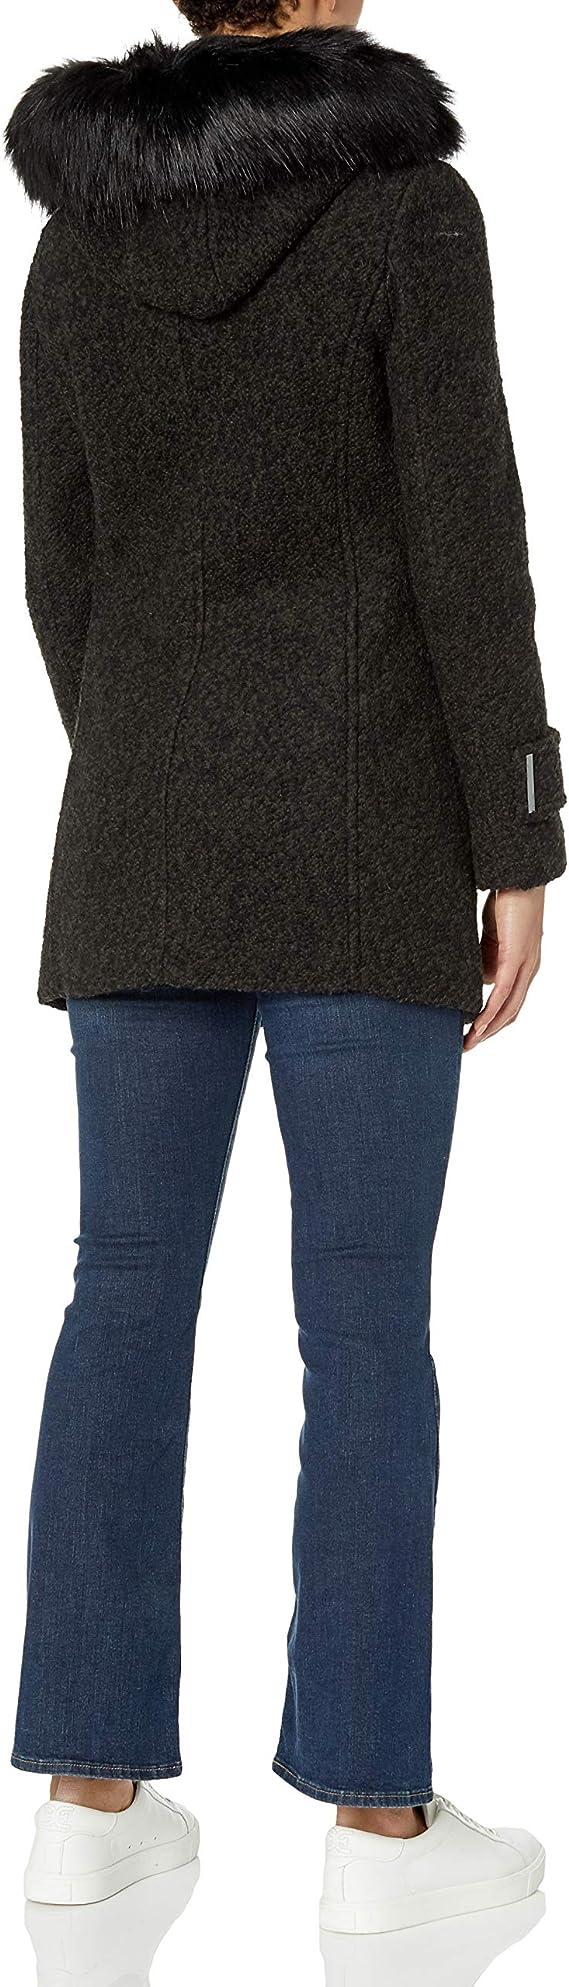 Calvin Klein 卡尔文克莱因 CK 女式连帽羊毛呢大衣外套 1.6折.49起 海淘转运到手约¥327